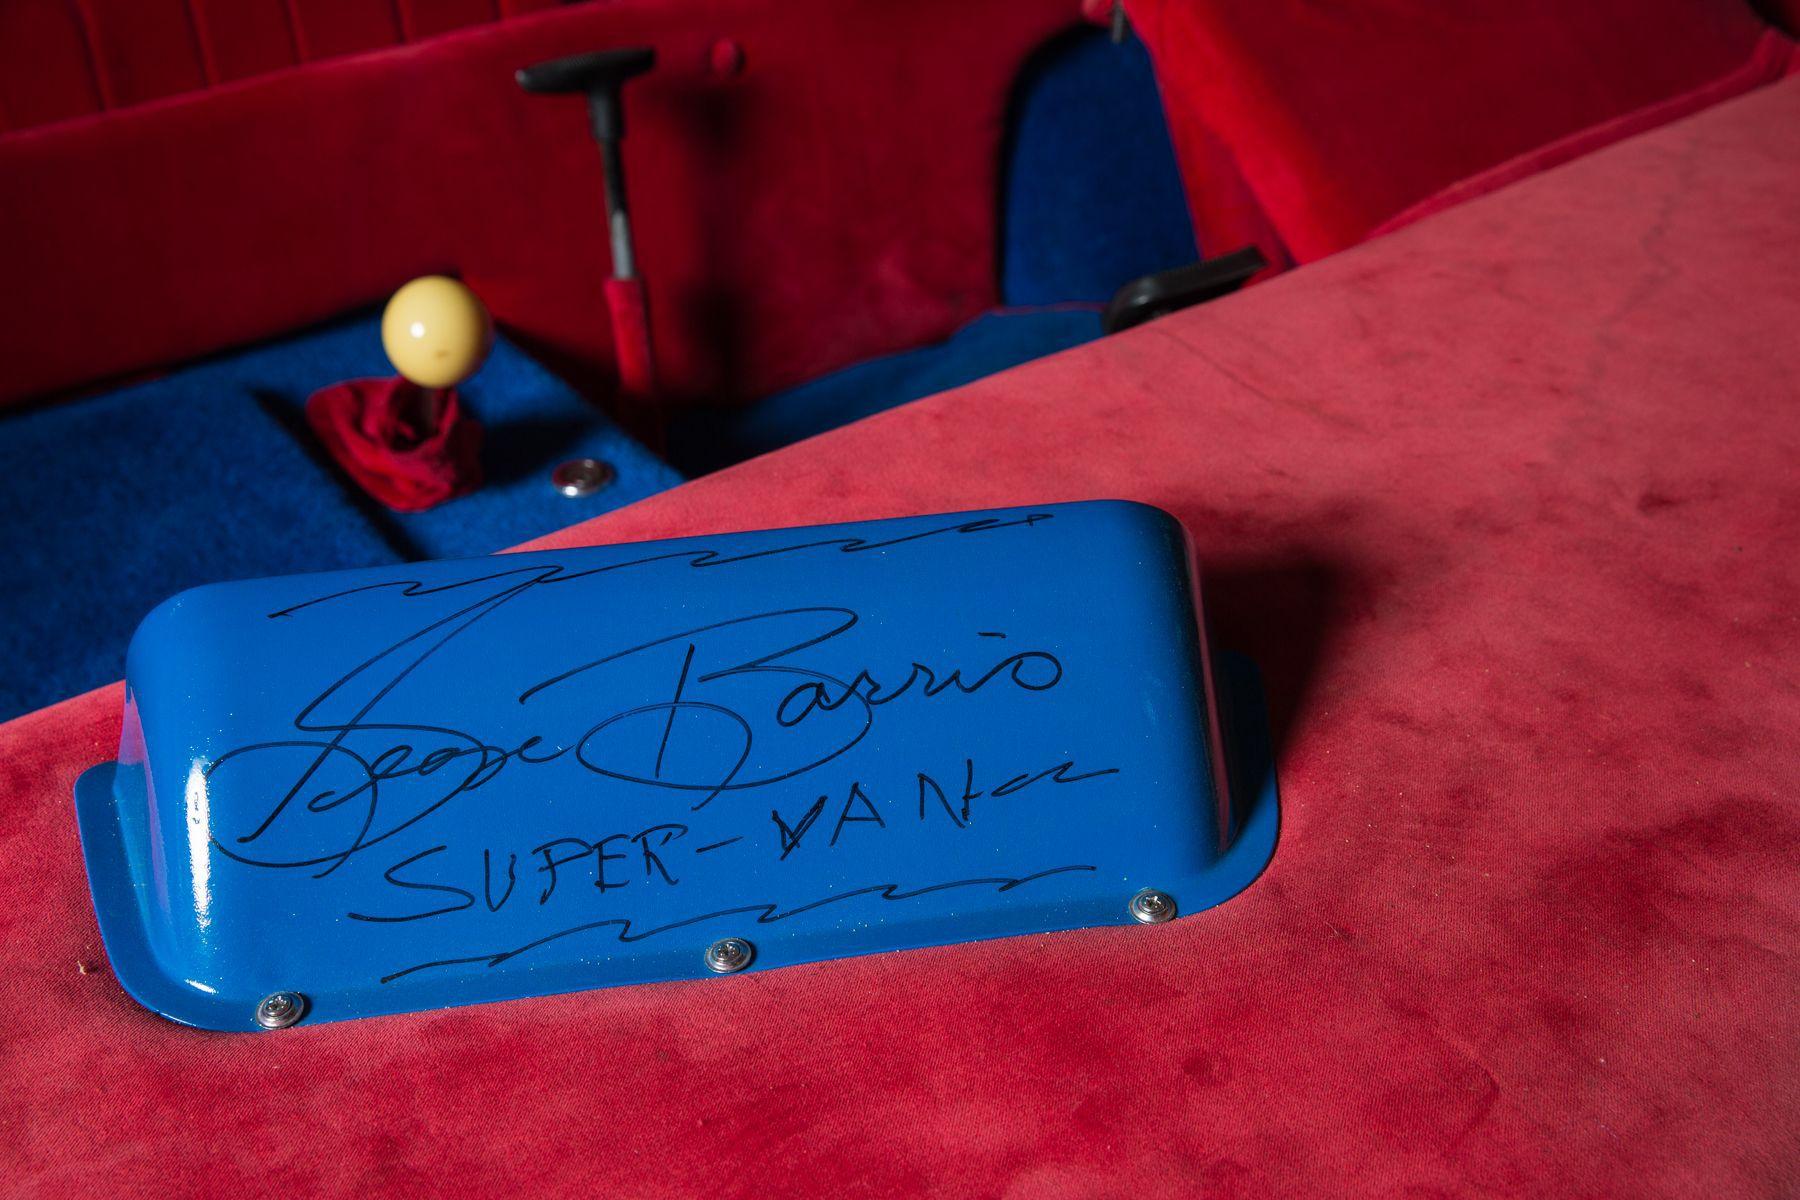 Hollywood Legends Super Van george barris signature